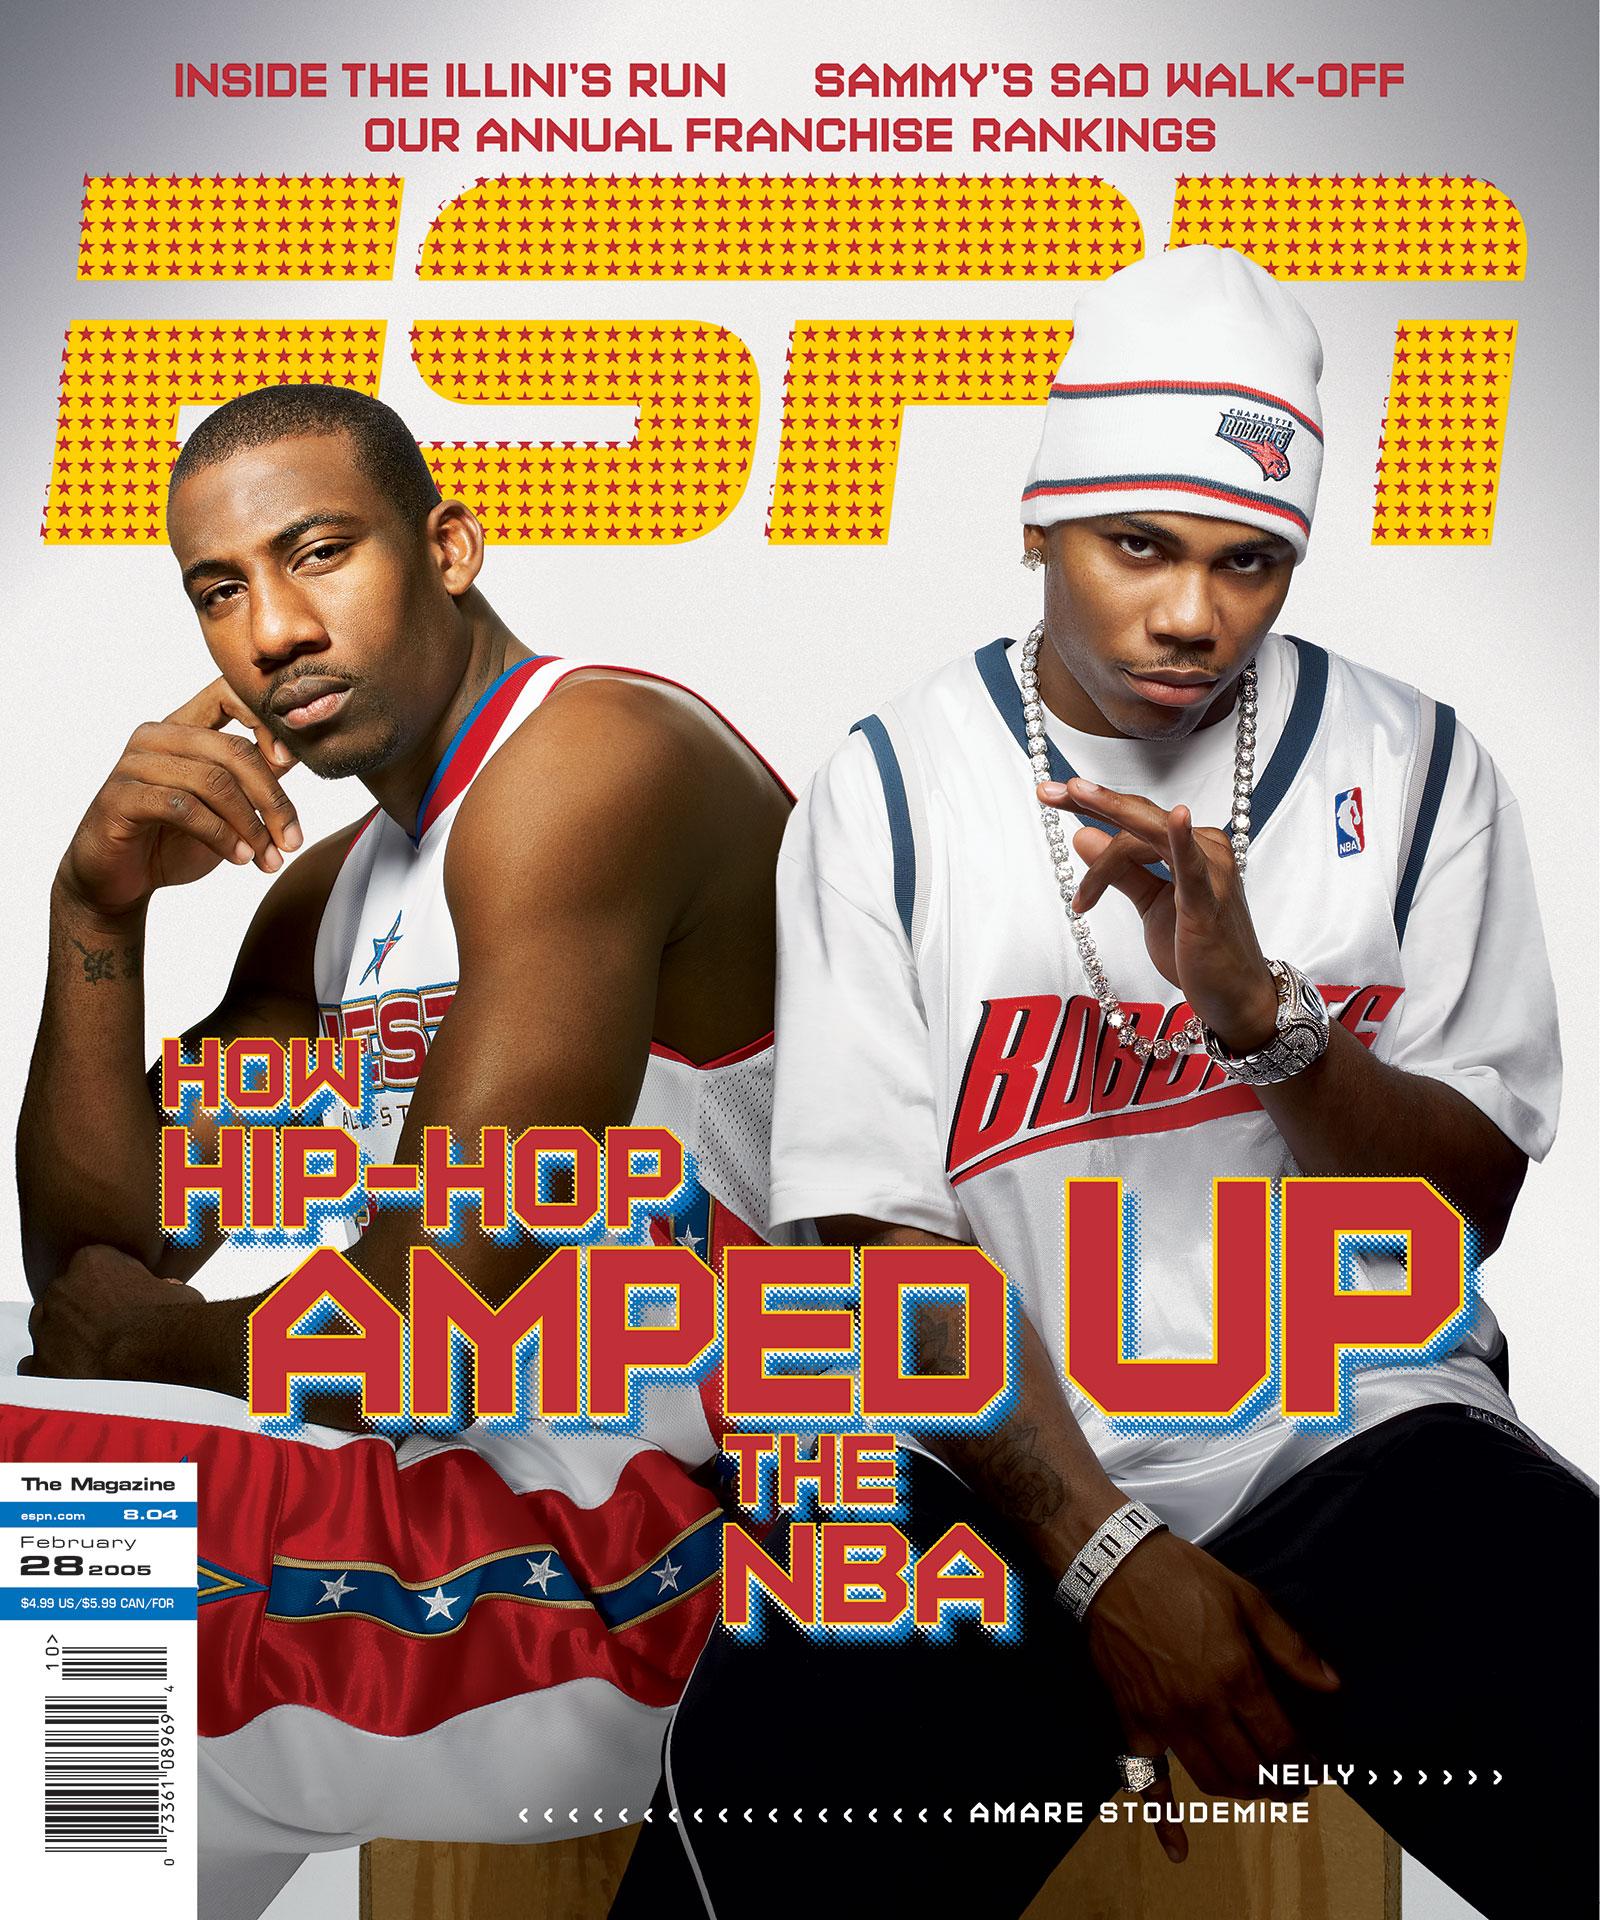 ESPN The Magazine 2005 Covers